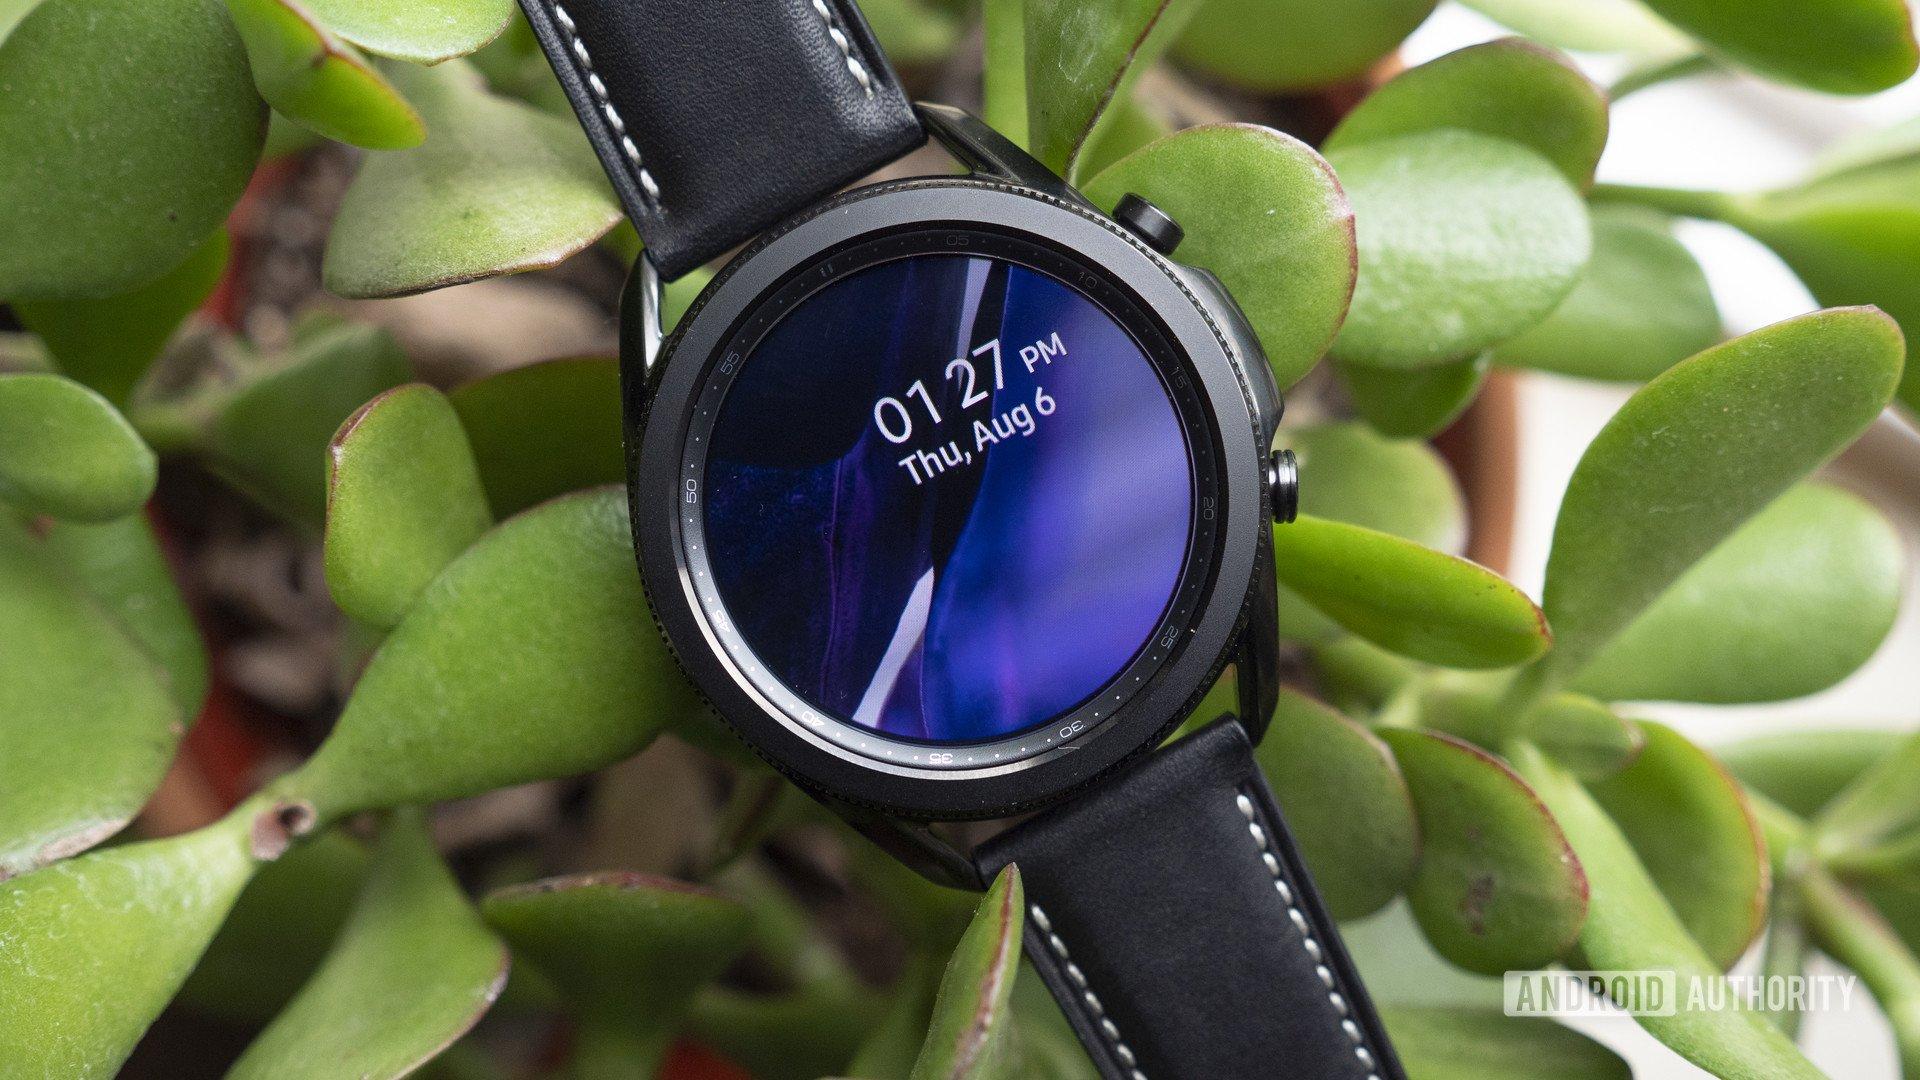 Samsung Galaxy Watch 4 LTE model passes through the FCC